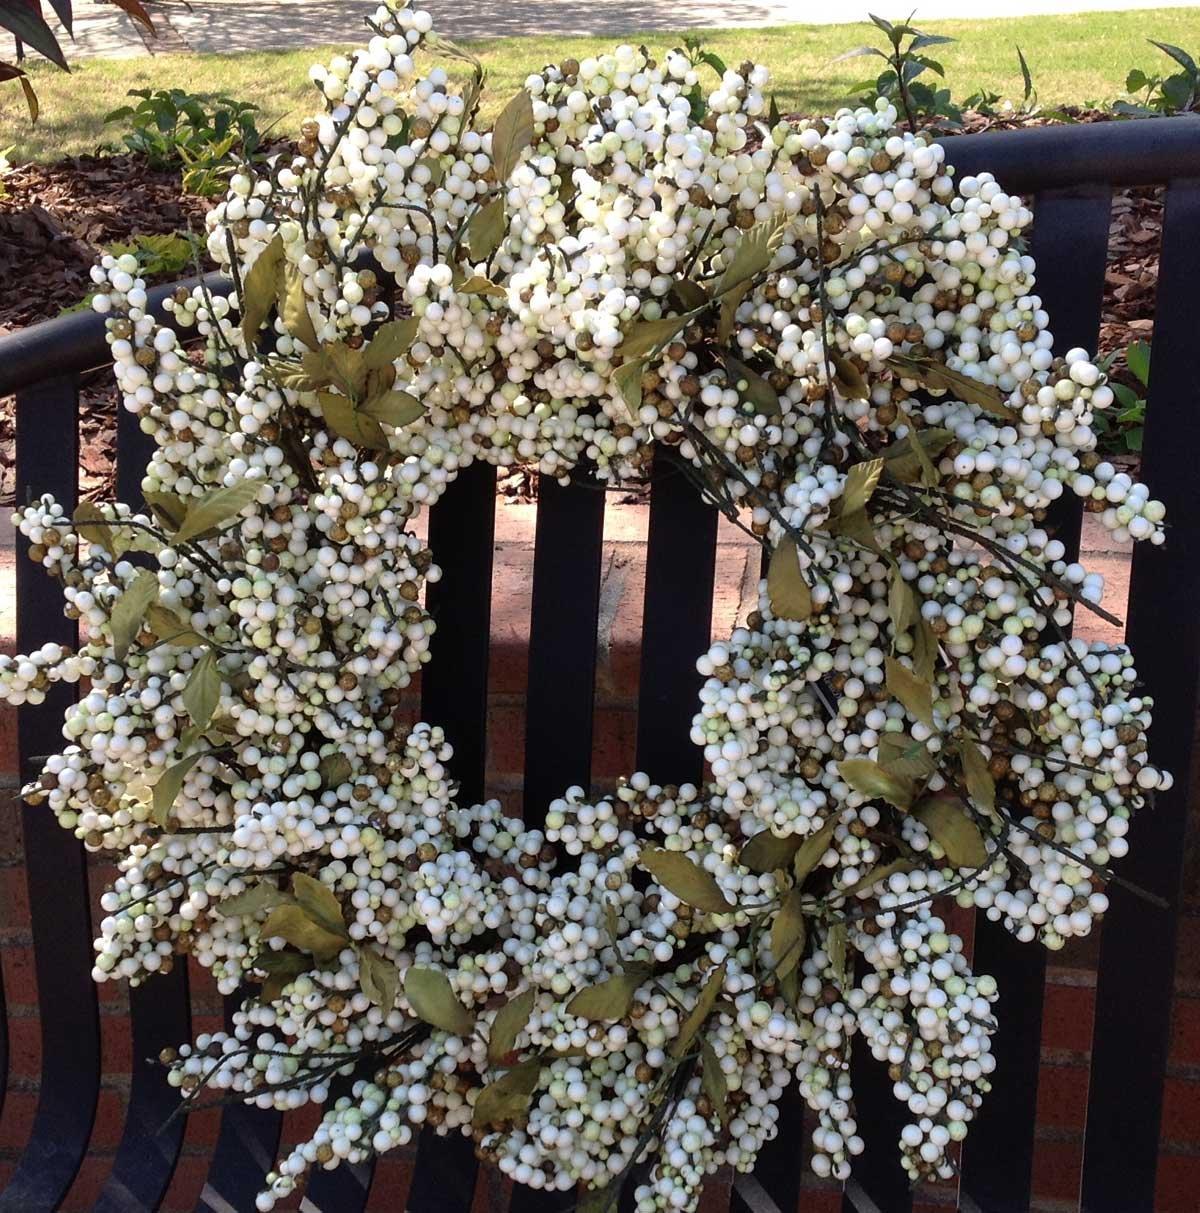 Flora Decor Bountiful Berry Wreath 24'' - Cream/Green